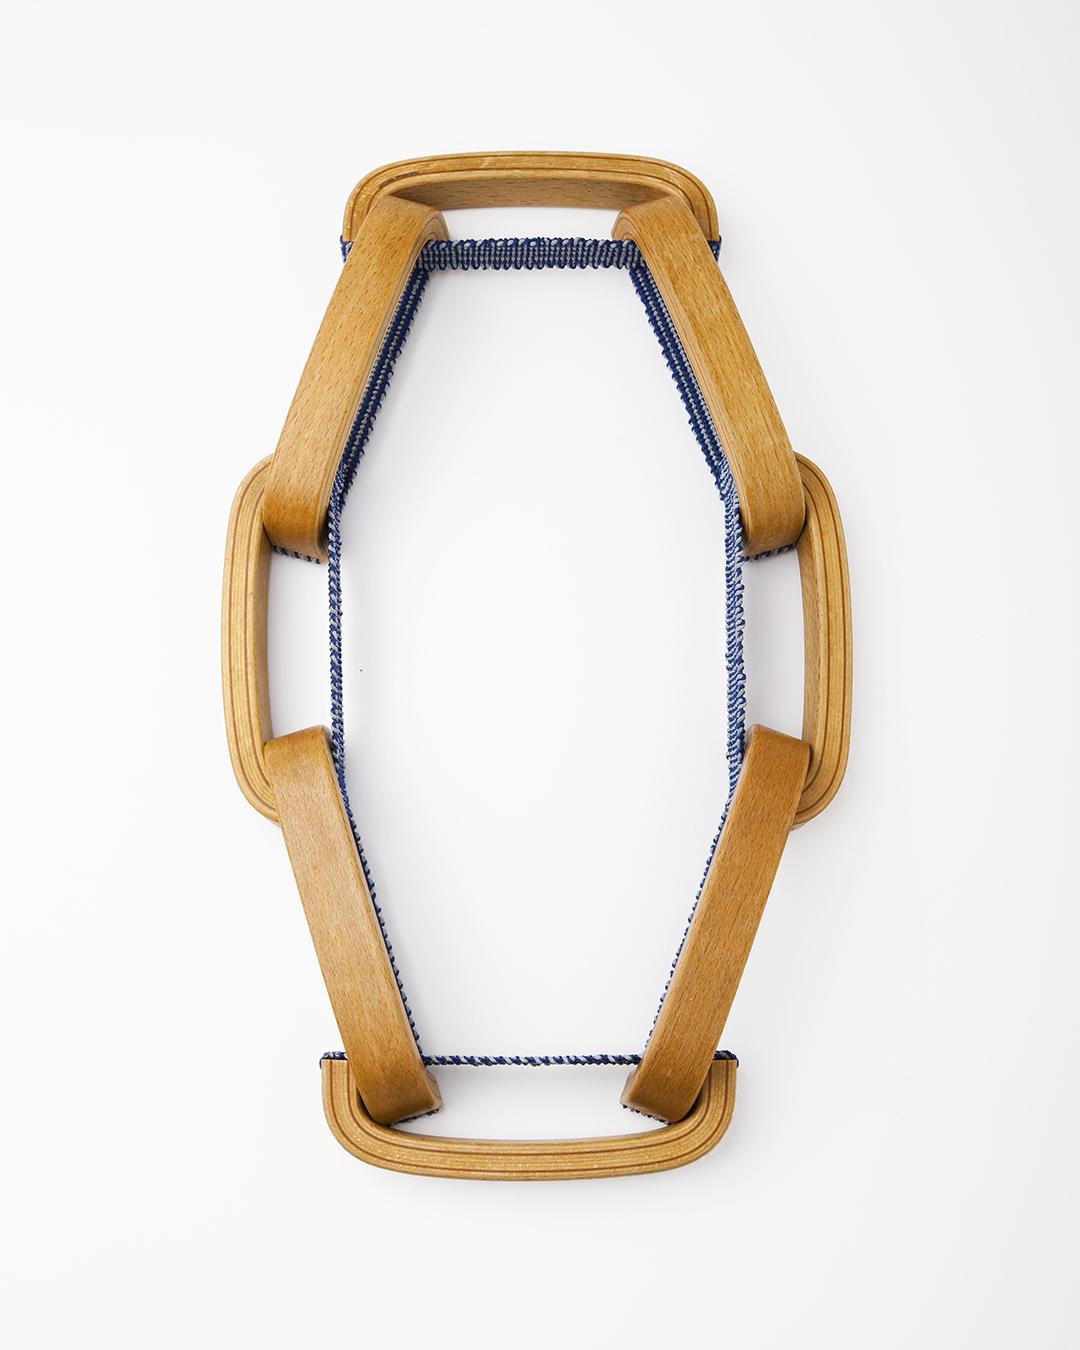 Barbara Schrobenhauser, Vom Tragen und Halten II (From Carrying and Holding), 2017, necklace; used wooden handles, woven strings L 600 mm, €1575